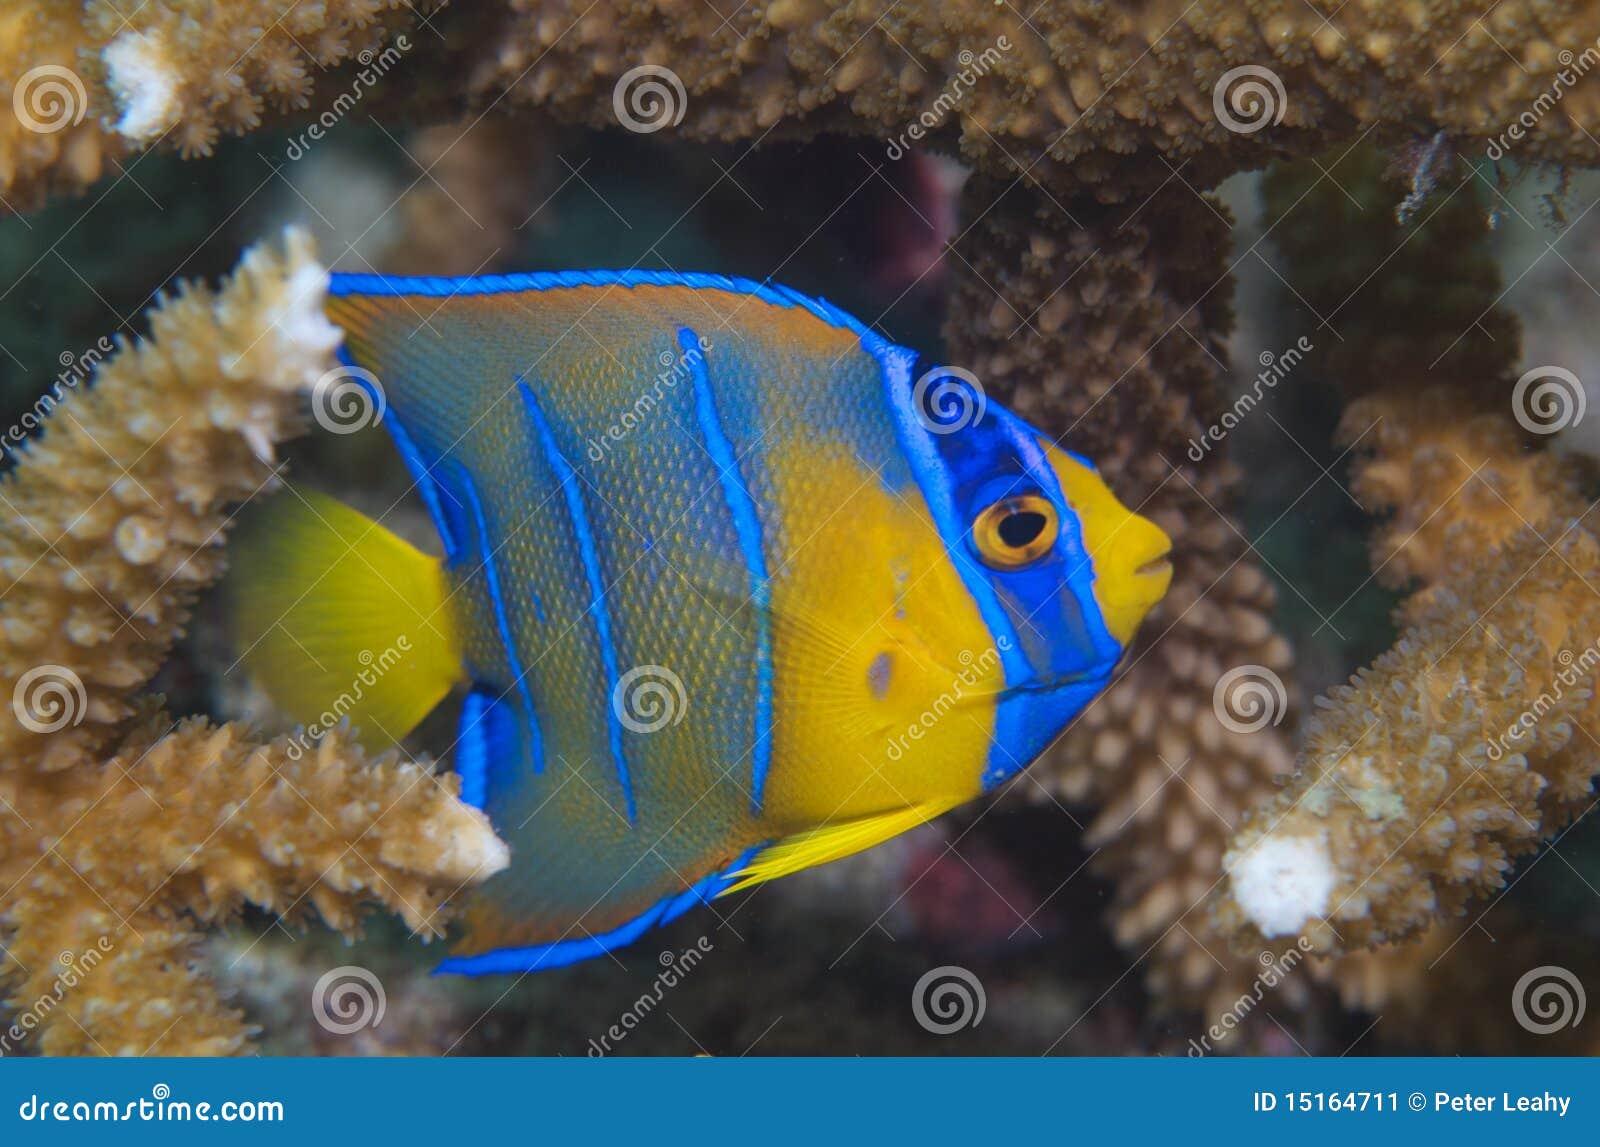 Juvenile queen angelfish holocanthus ciliaris stock image for Queen angel fish